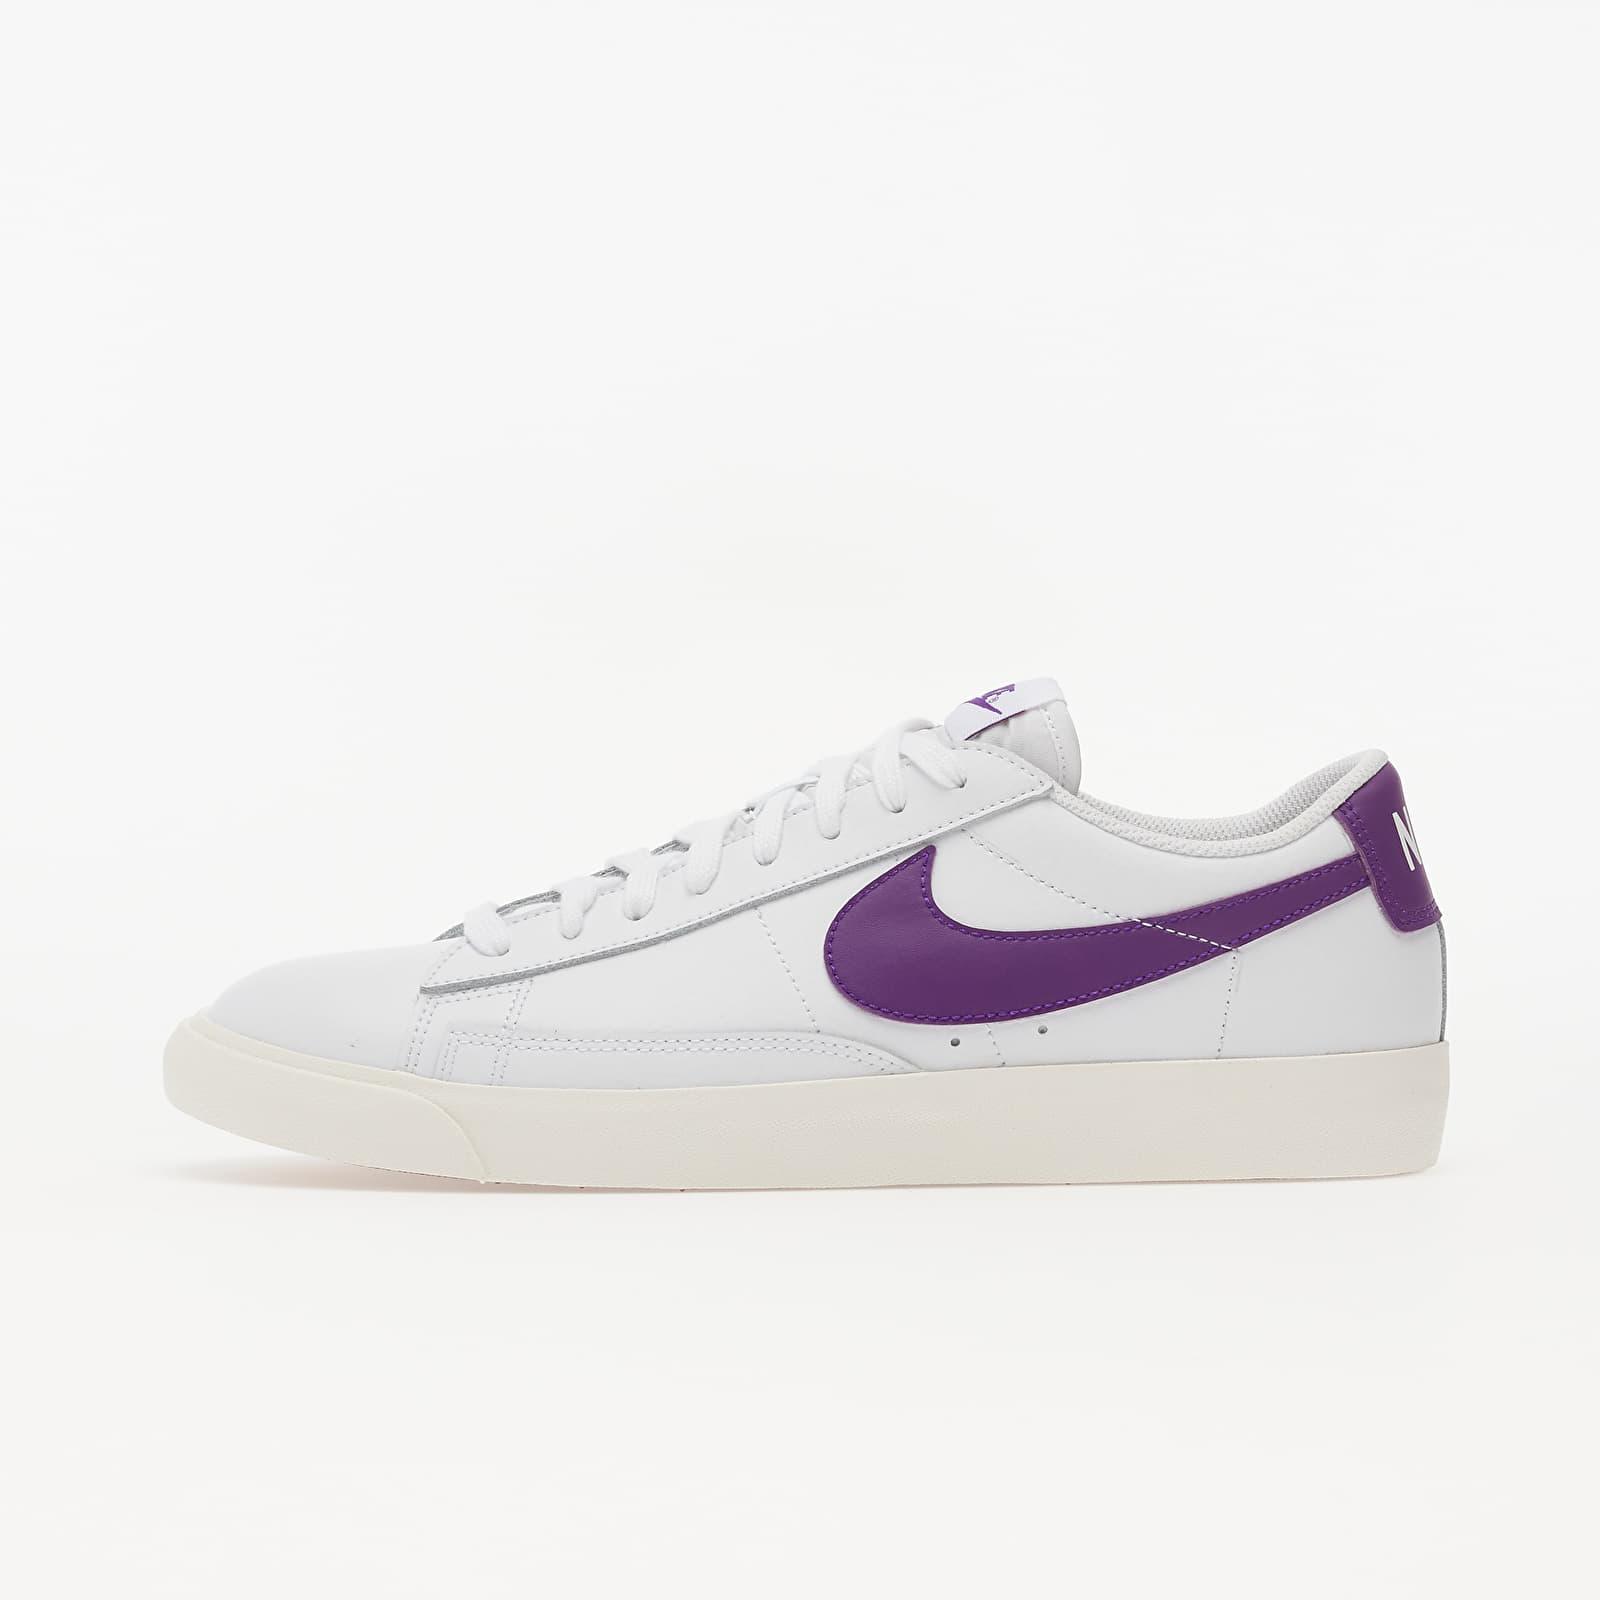 Men's shoes Nike Blazer Low Leather White/ Voltage Purple-Sail